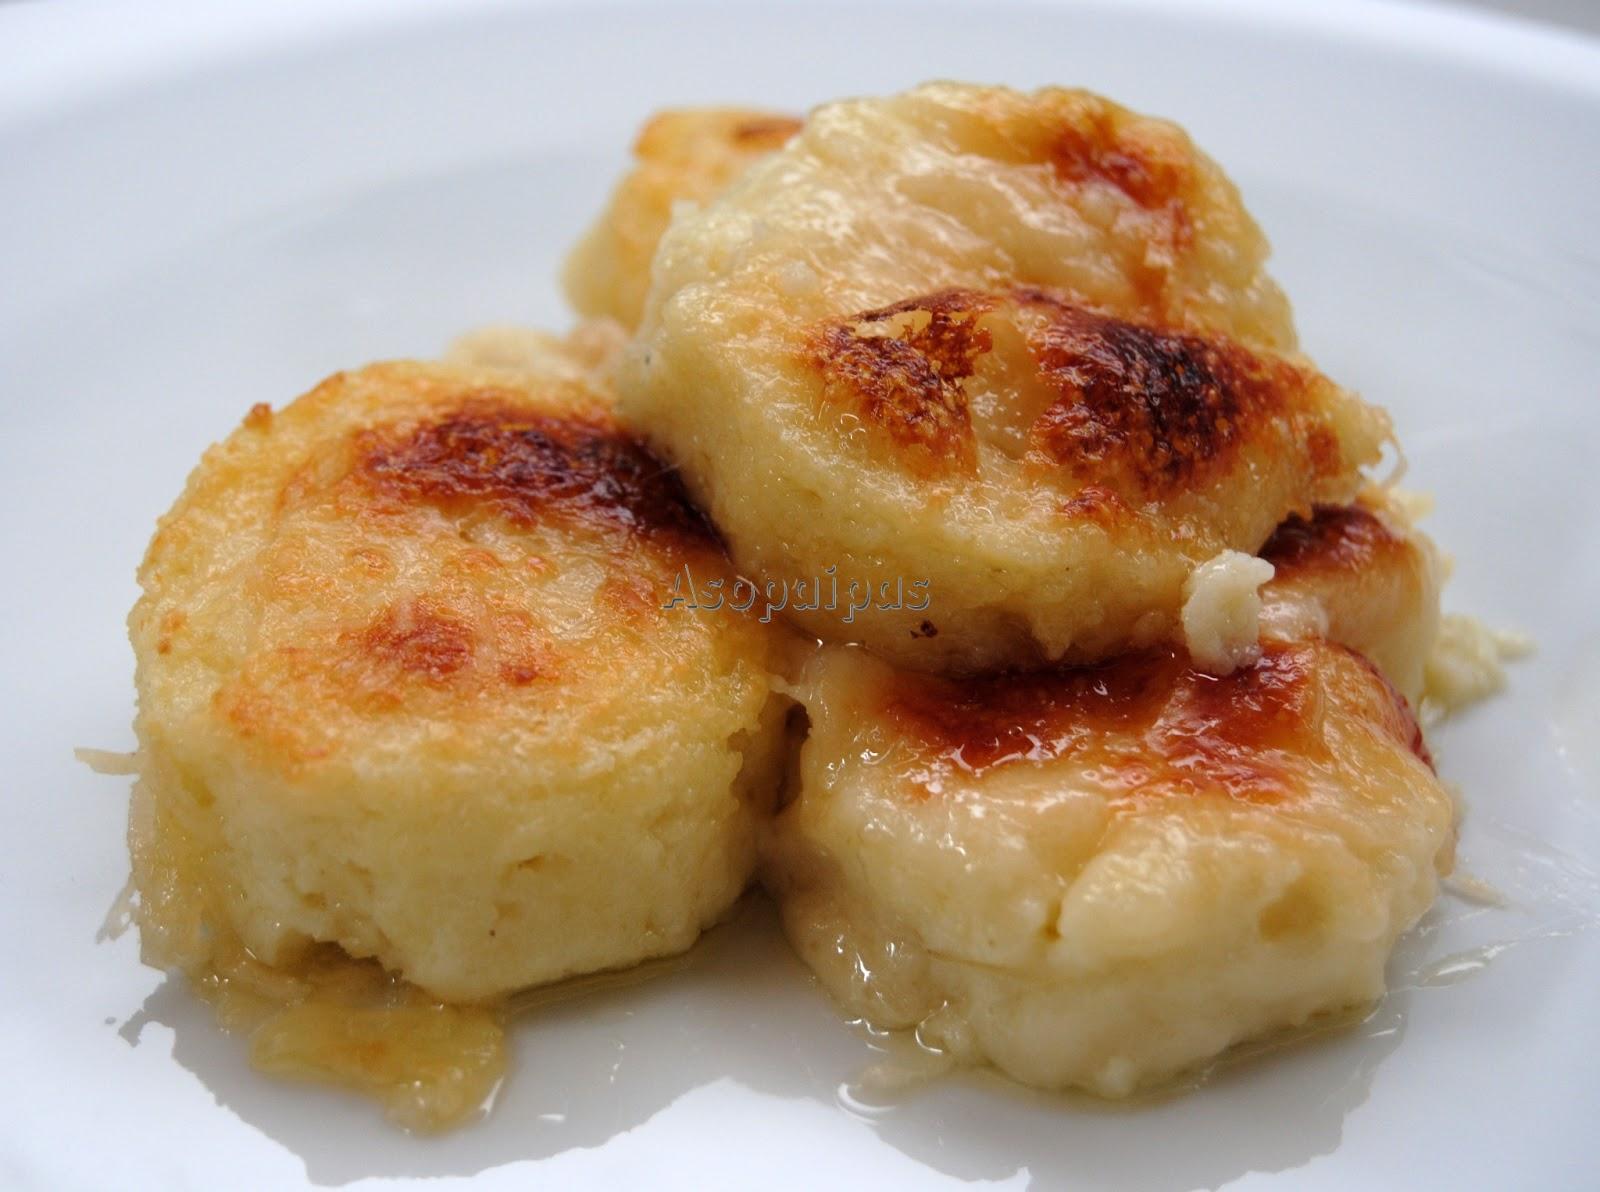 ... Recetas de Cocina Casera .: Ñoquis a la Romana (Gnocchi alla Romana